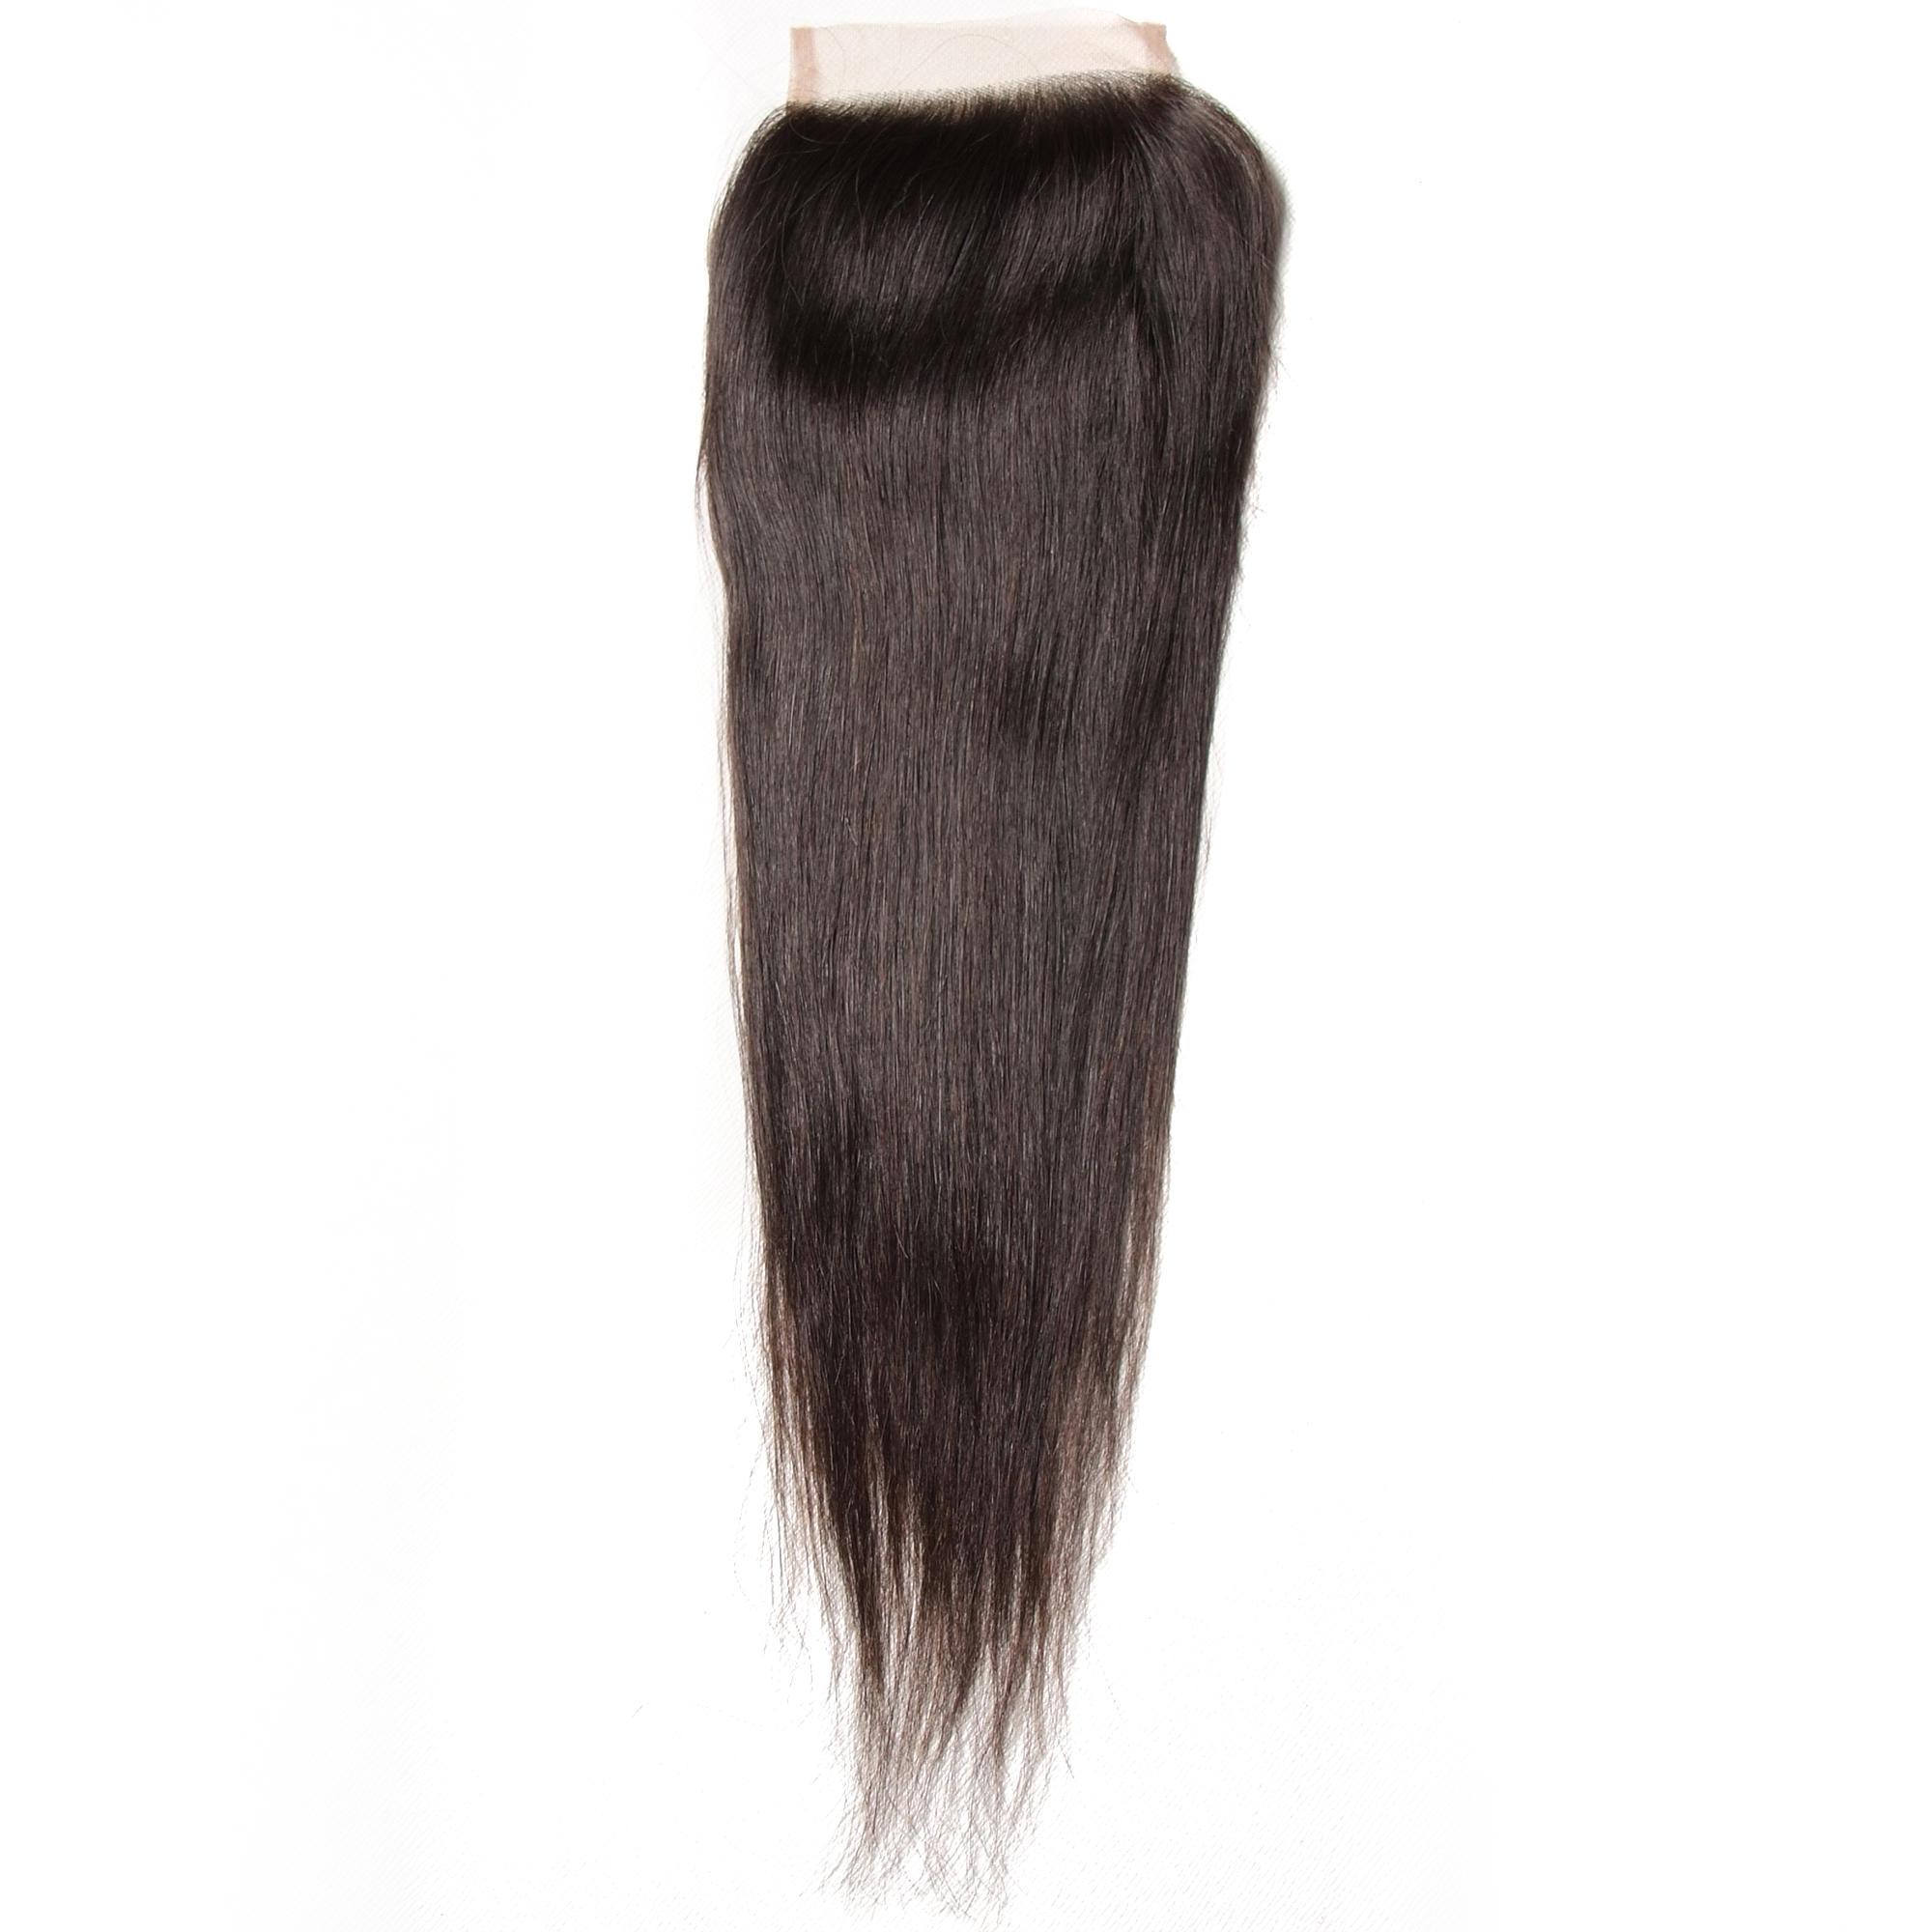 UNice Hair image 22